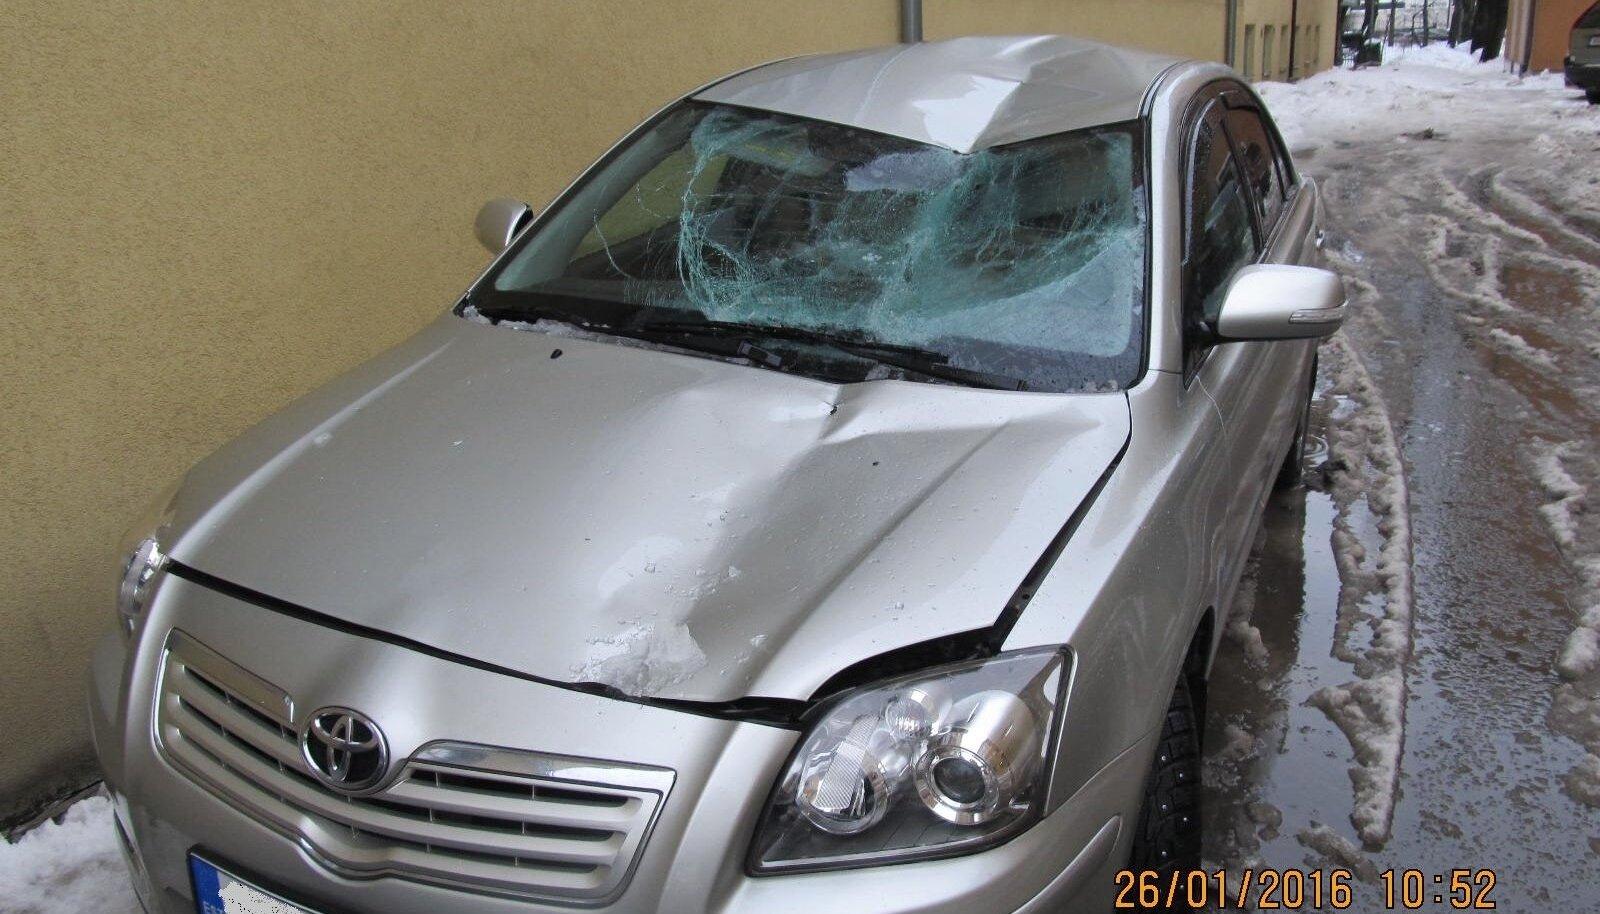 Jääkamakas kukkus autole